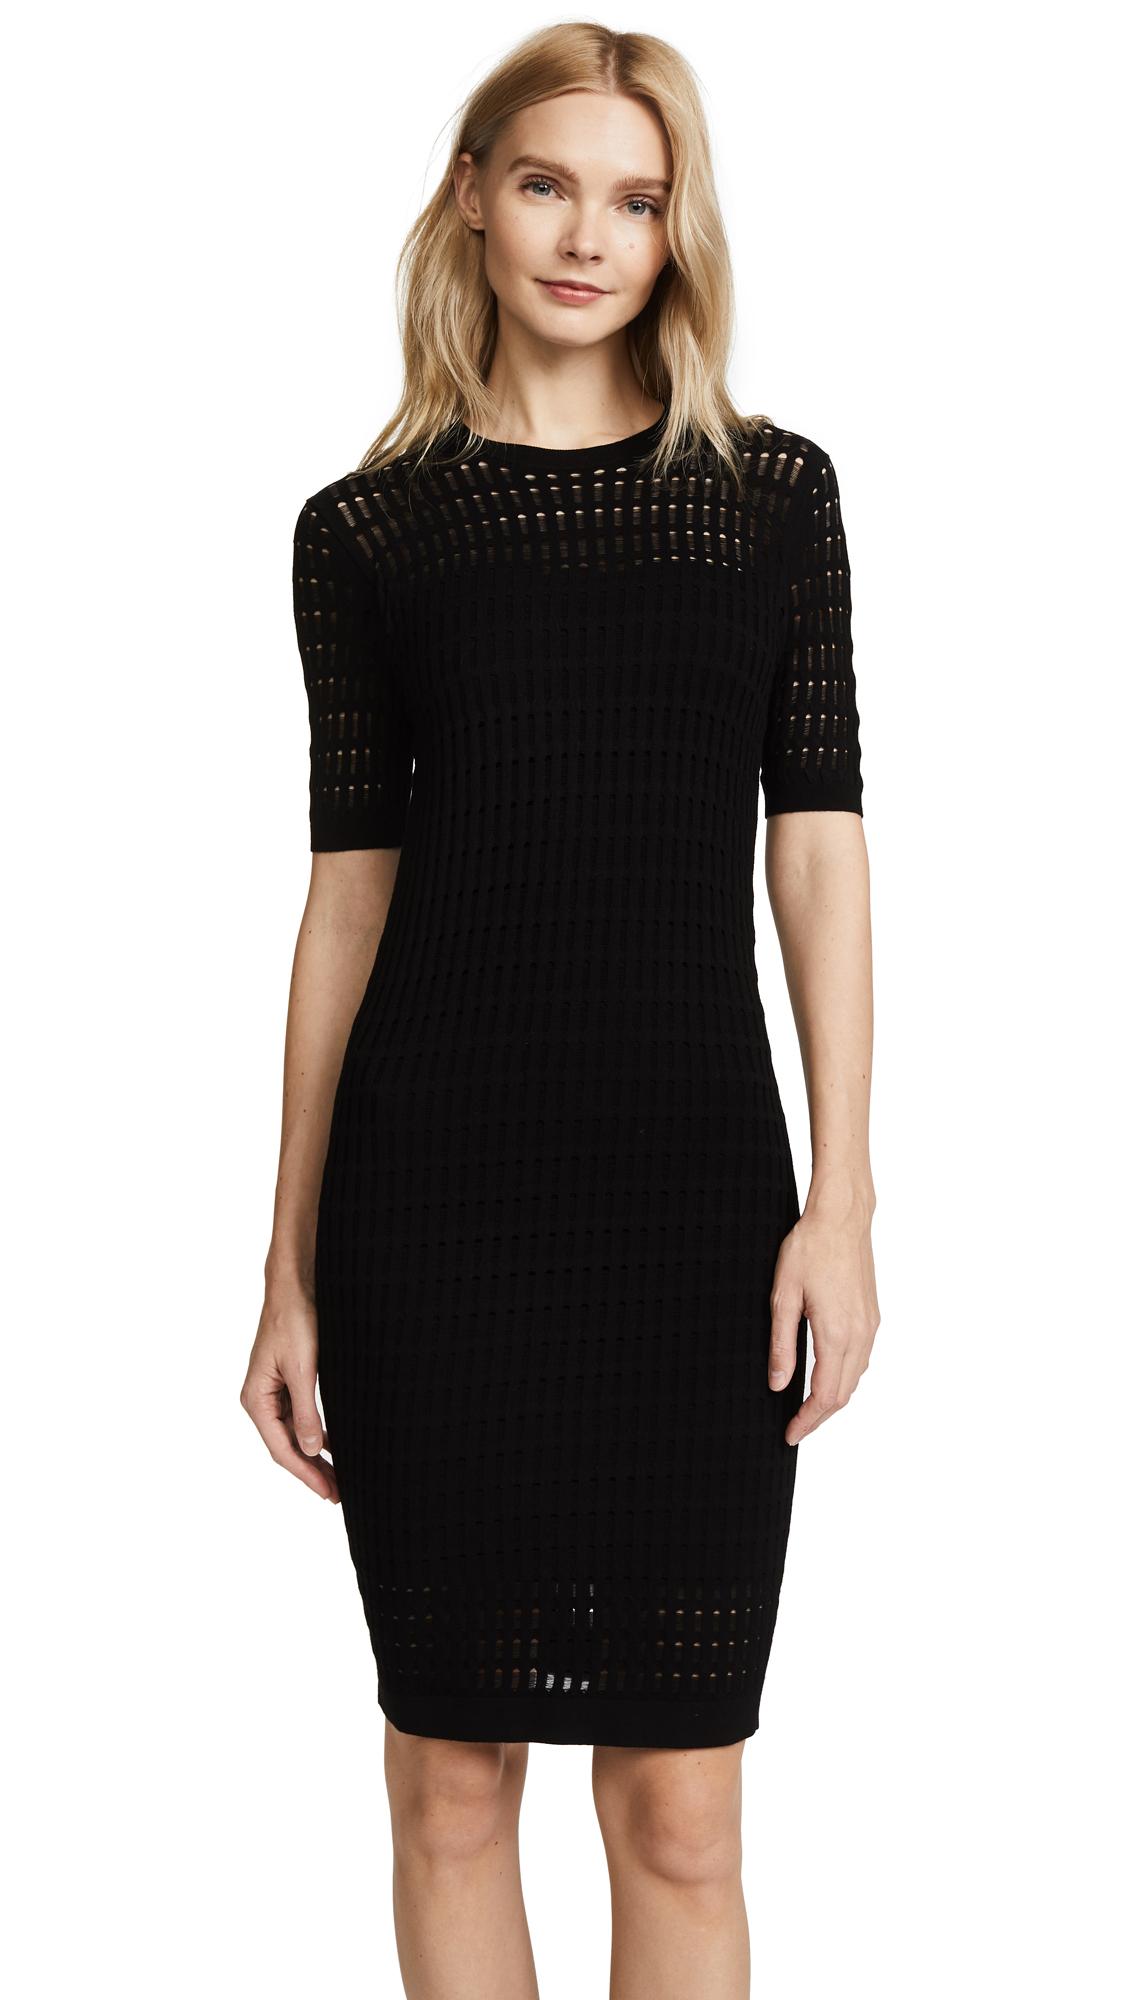 T by Alexander Wang Lace Short Sleeve Dress - Black